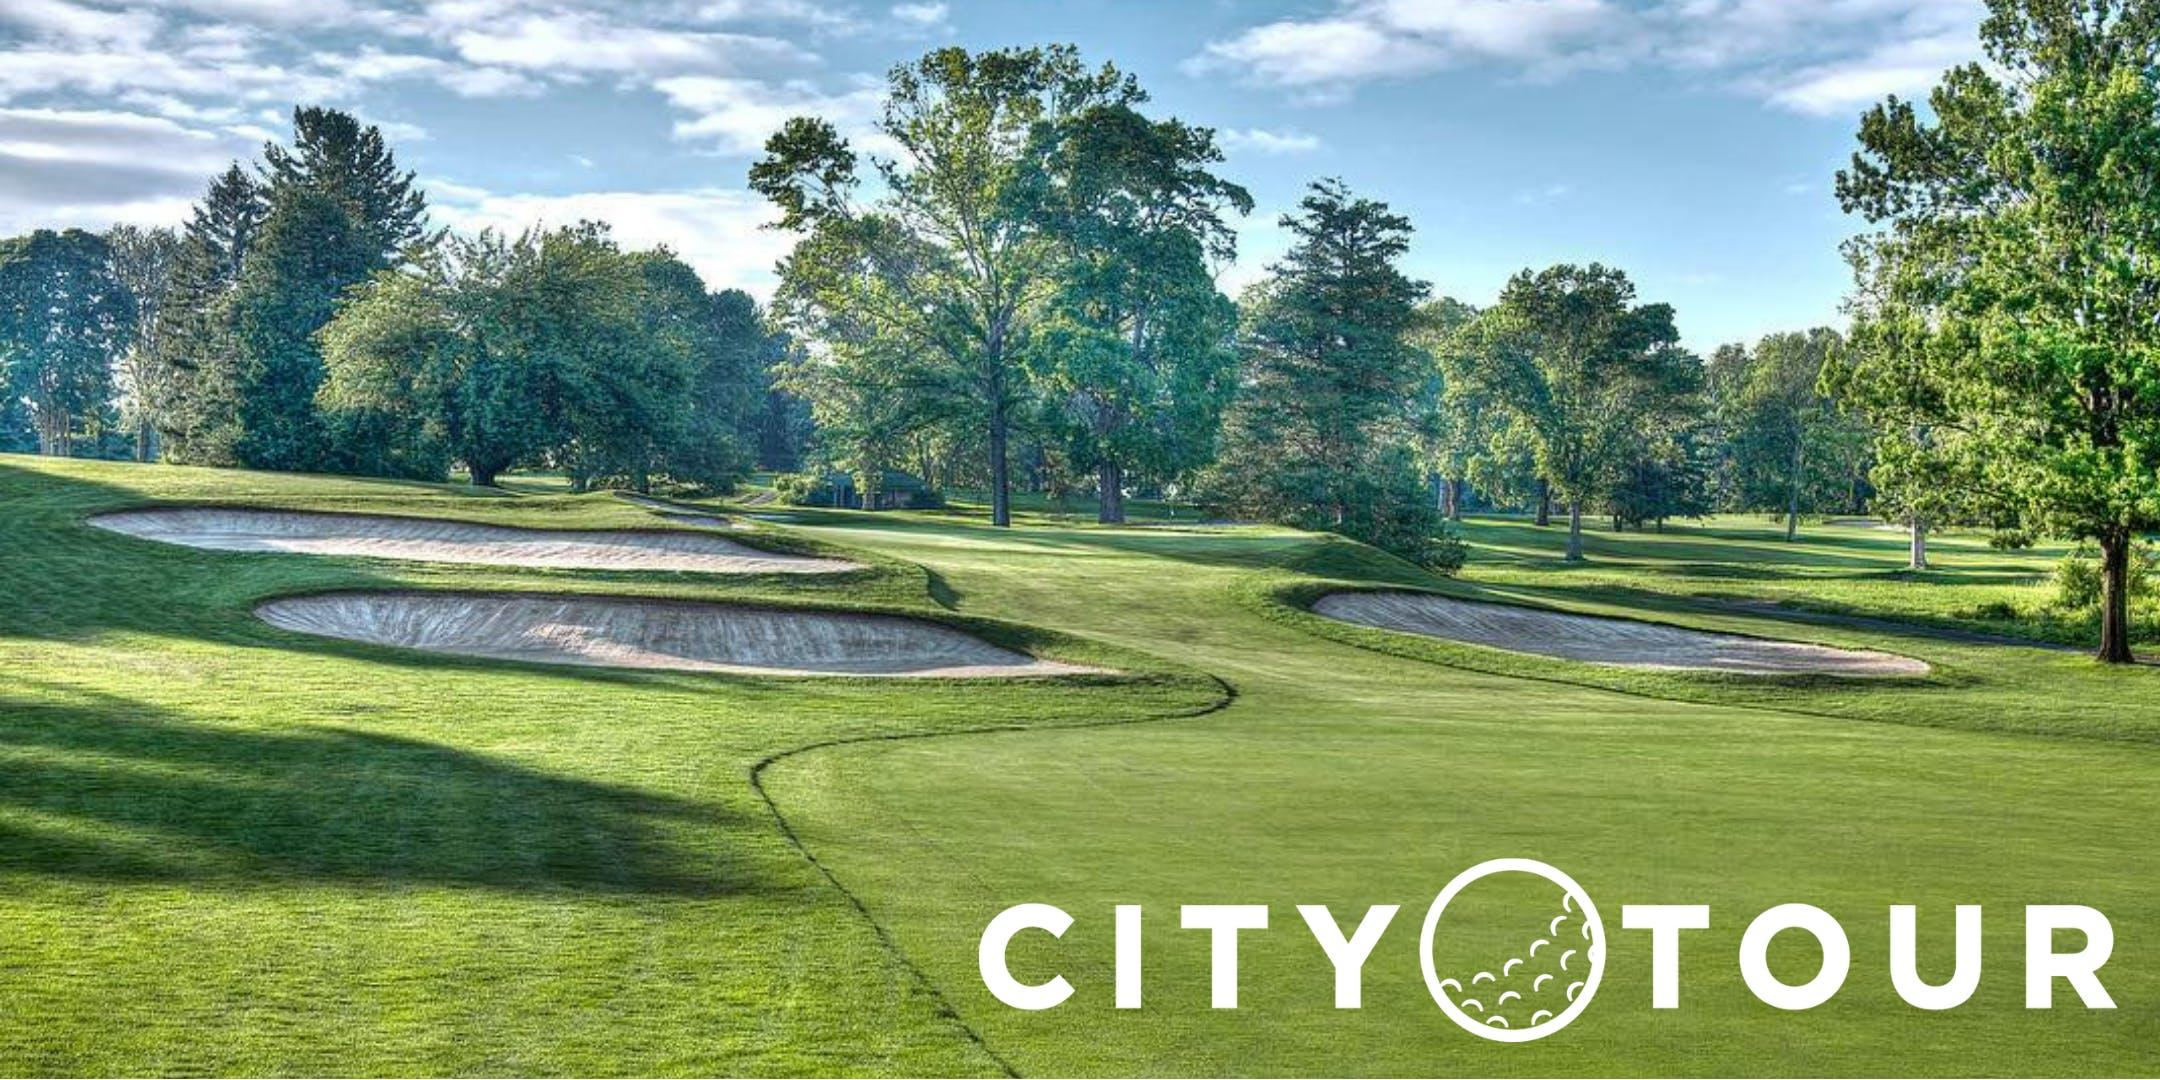 Hartford City Tour -Keney Park Golf Club